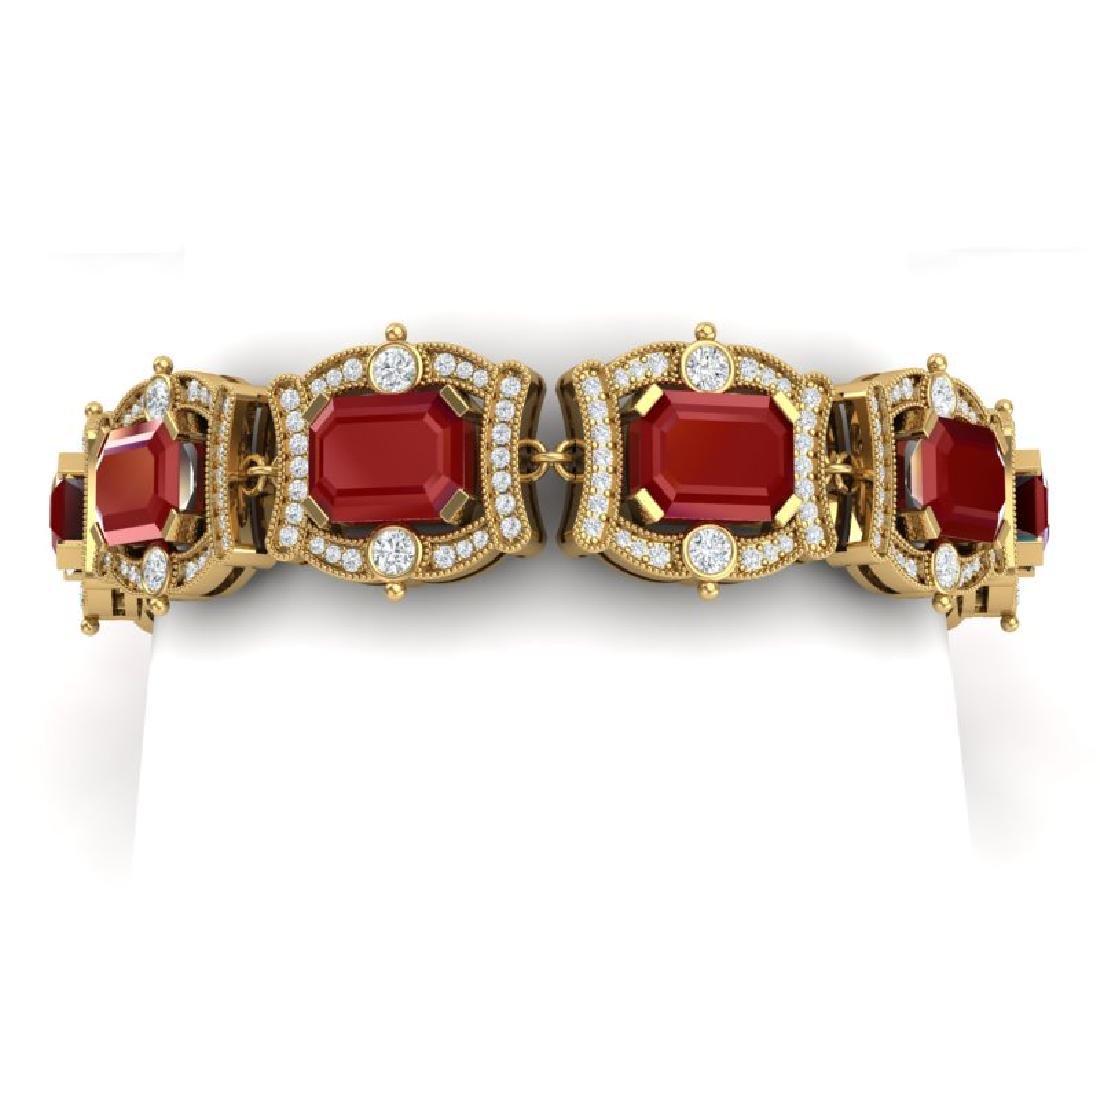 43.87 CTW Royalty Ruby & VS Diamond Bracelet 18K Yellow